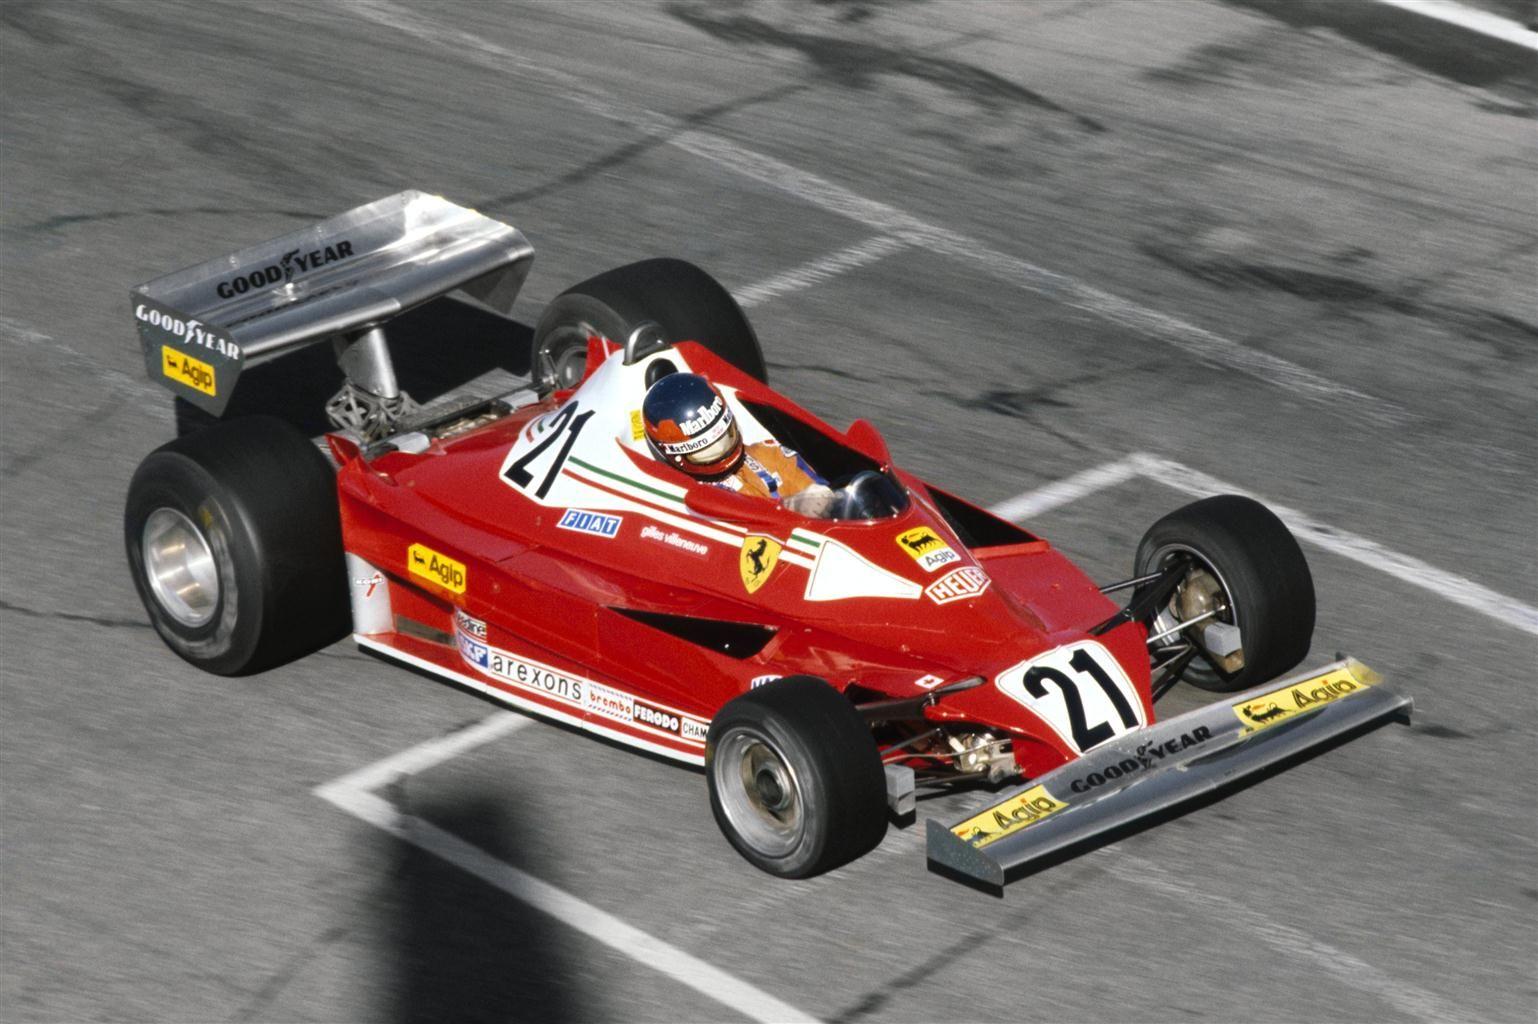 Gilles Villeneuve, Ferrari 312T2, 1977 Canadian GP (Gilles